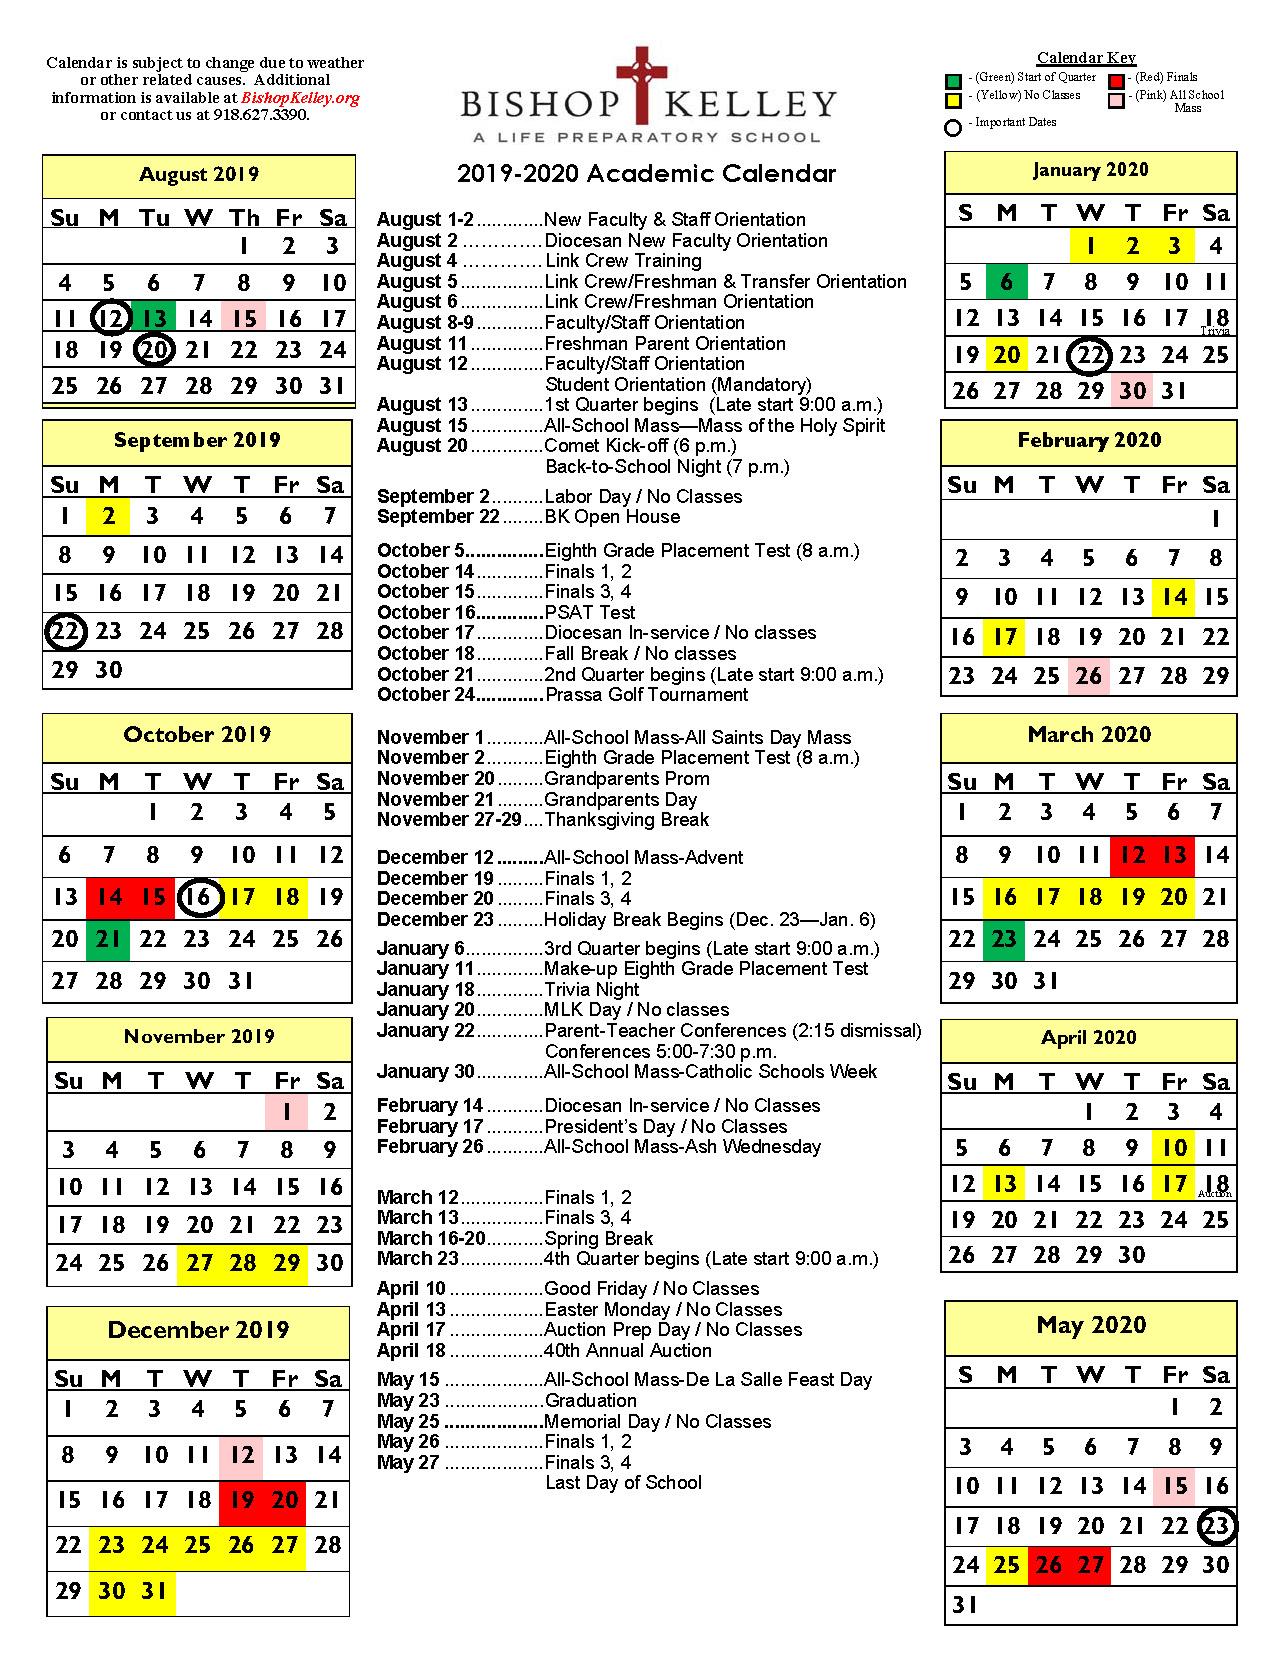 Academic Calendars | Bishop Kelley throughout Catholic Liturgical Calendar Year C 2019-2020